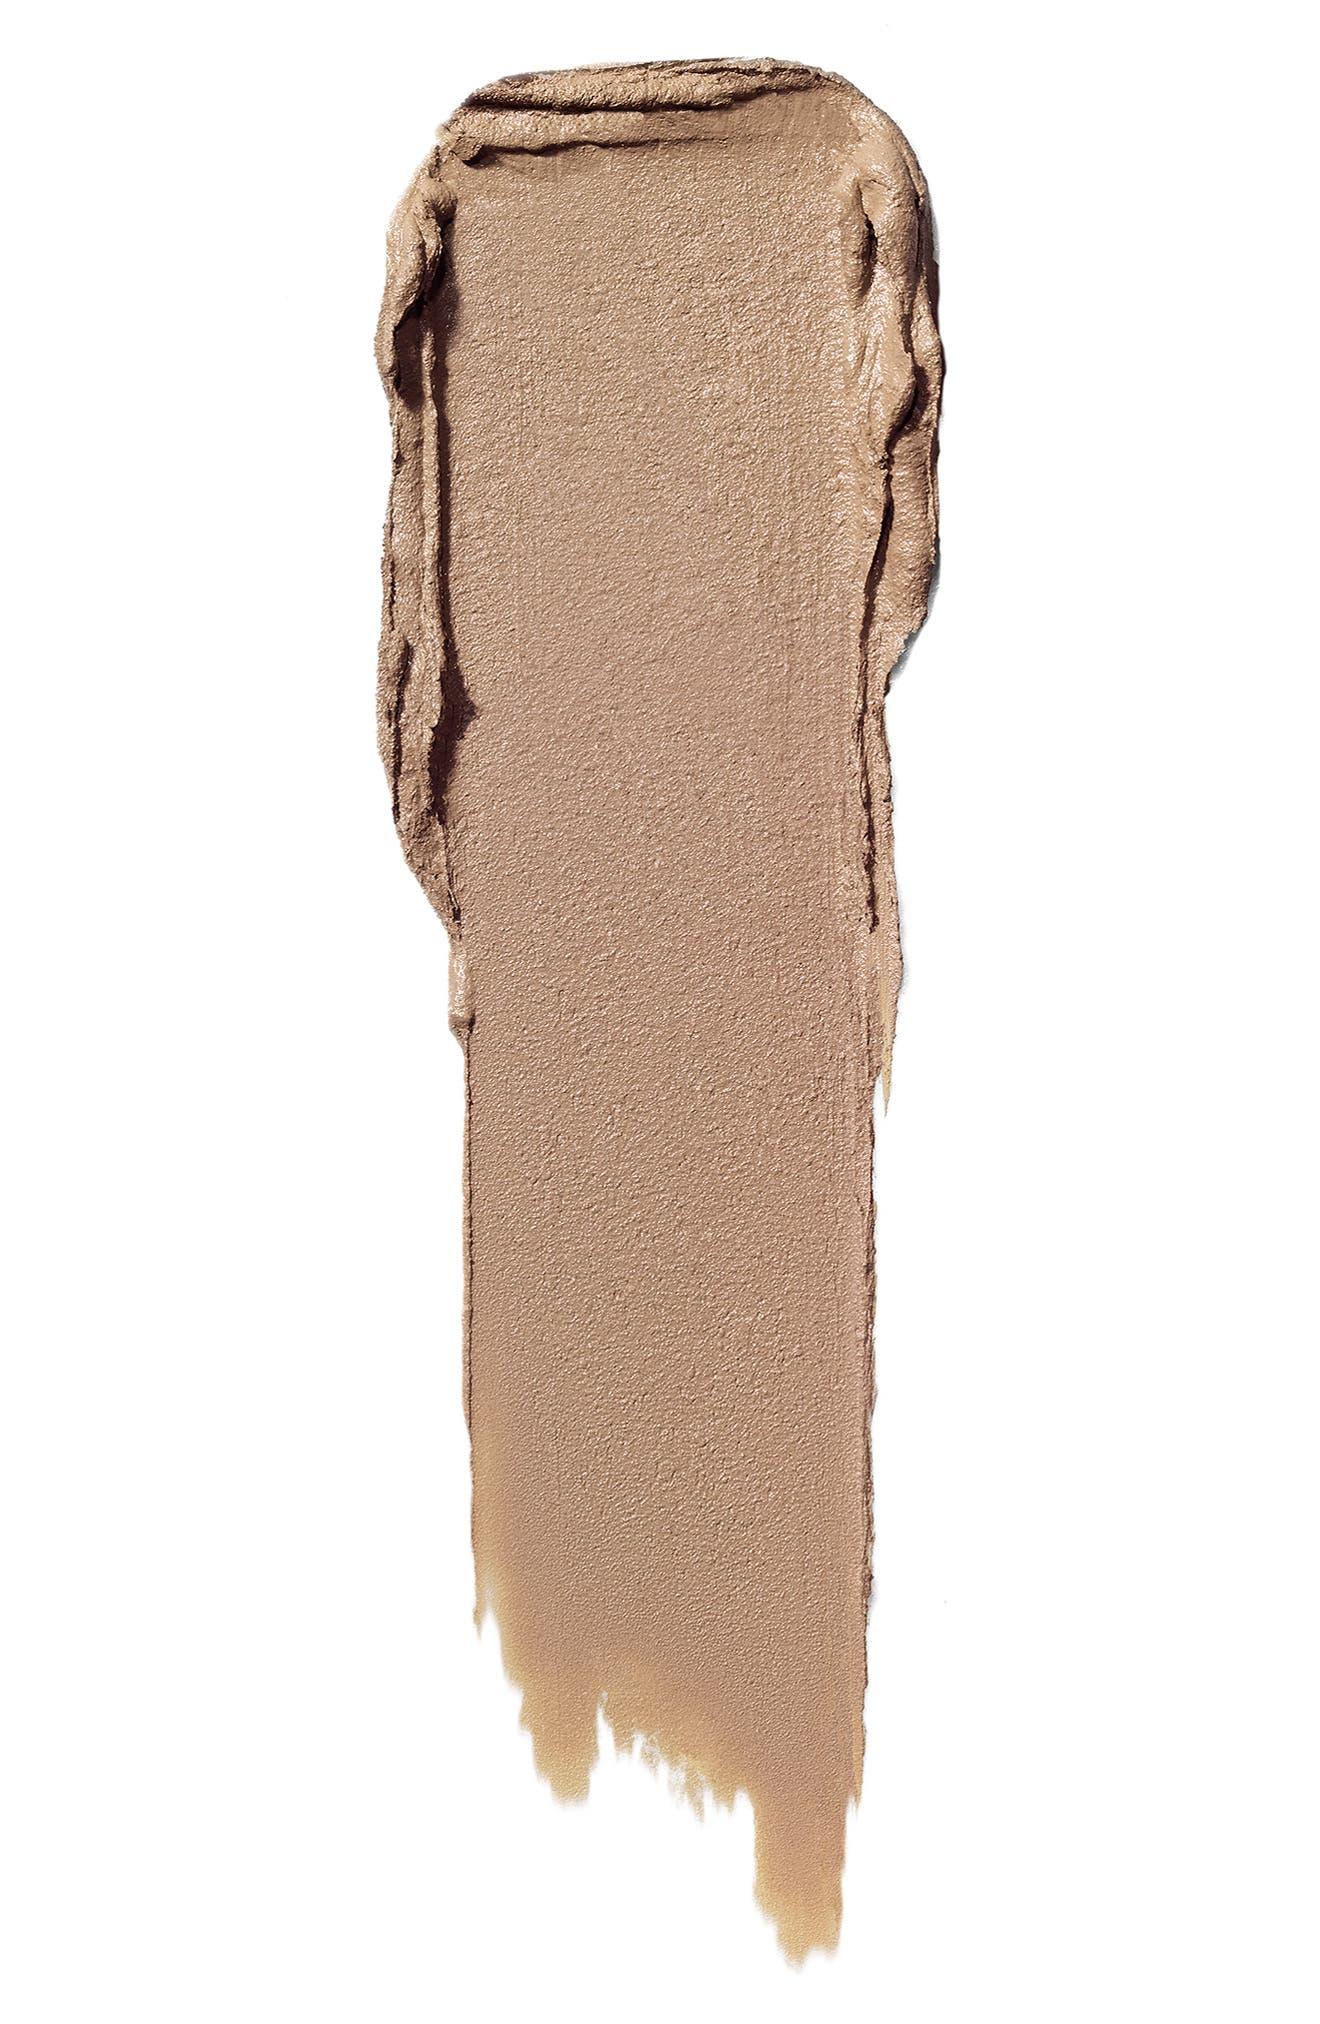 BOBBI BROWN, Long-Wear Cream Shadow, Alternate thumbnail 2, color, CEMENT